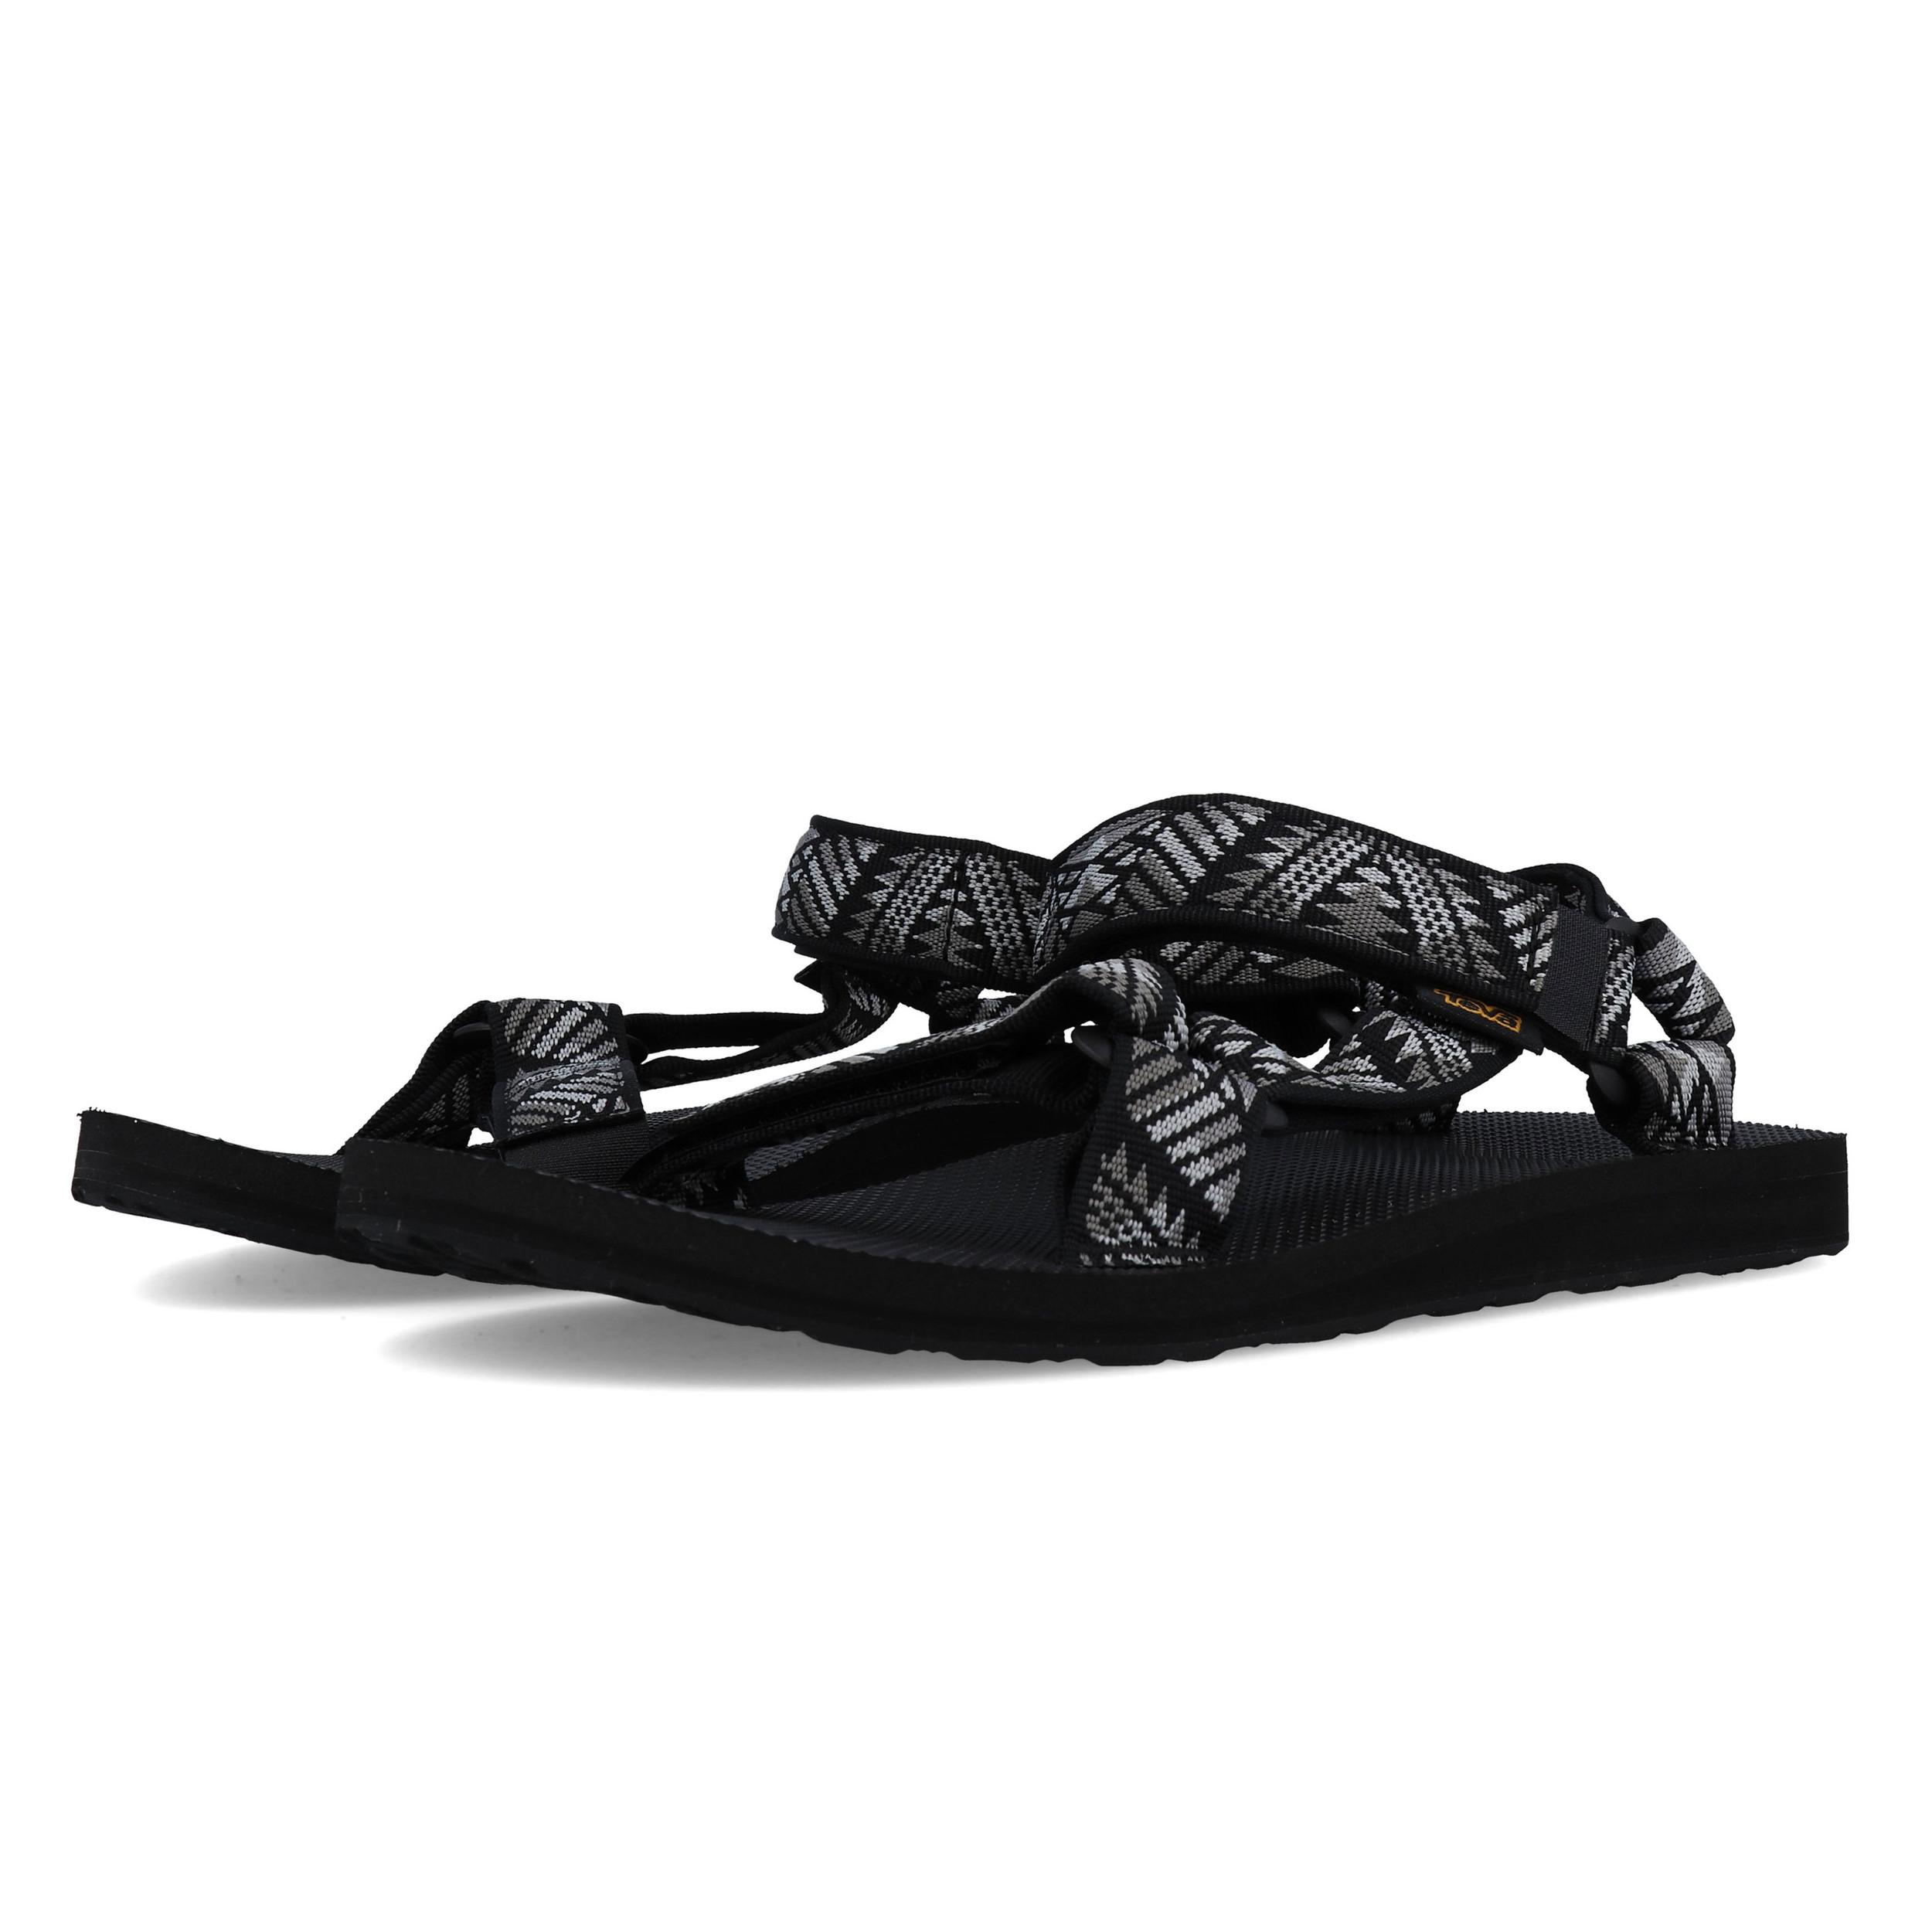 736f35c876 Herren Original Universal Sommer Schuhe Sandalen Schwarz Outdoor Teva  Freizeit nnqfuj991-Sandalen